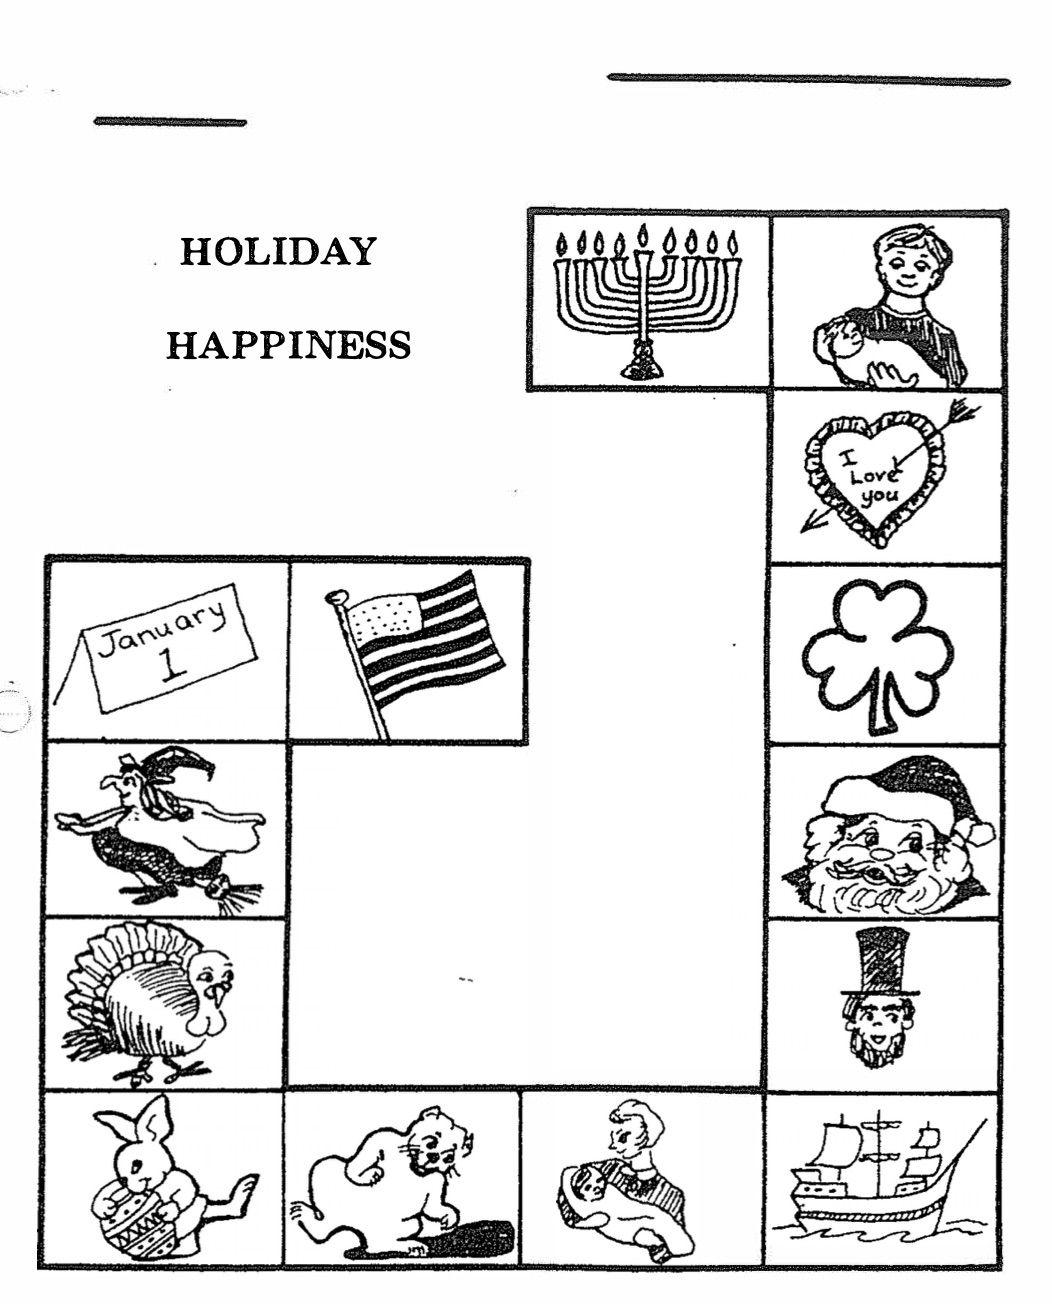 Listening Skills Holiday Happiness Page 2